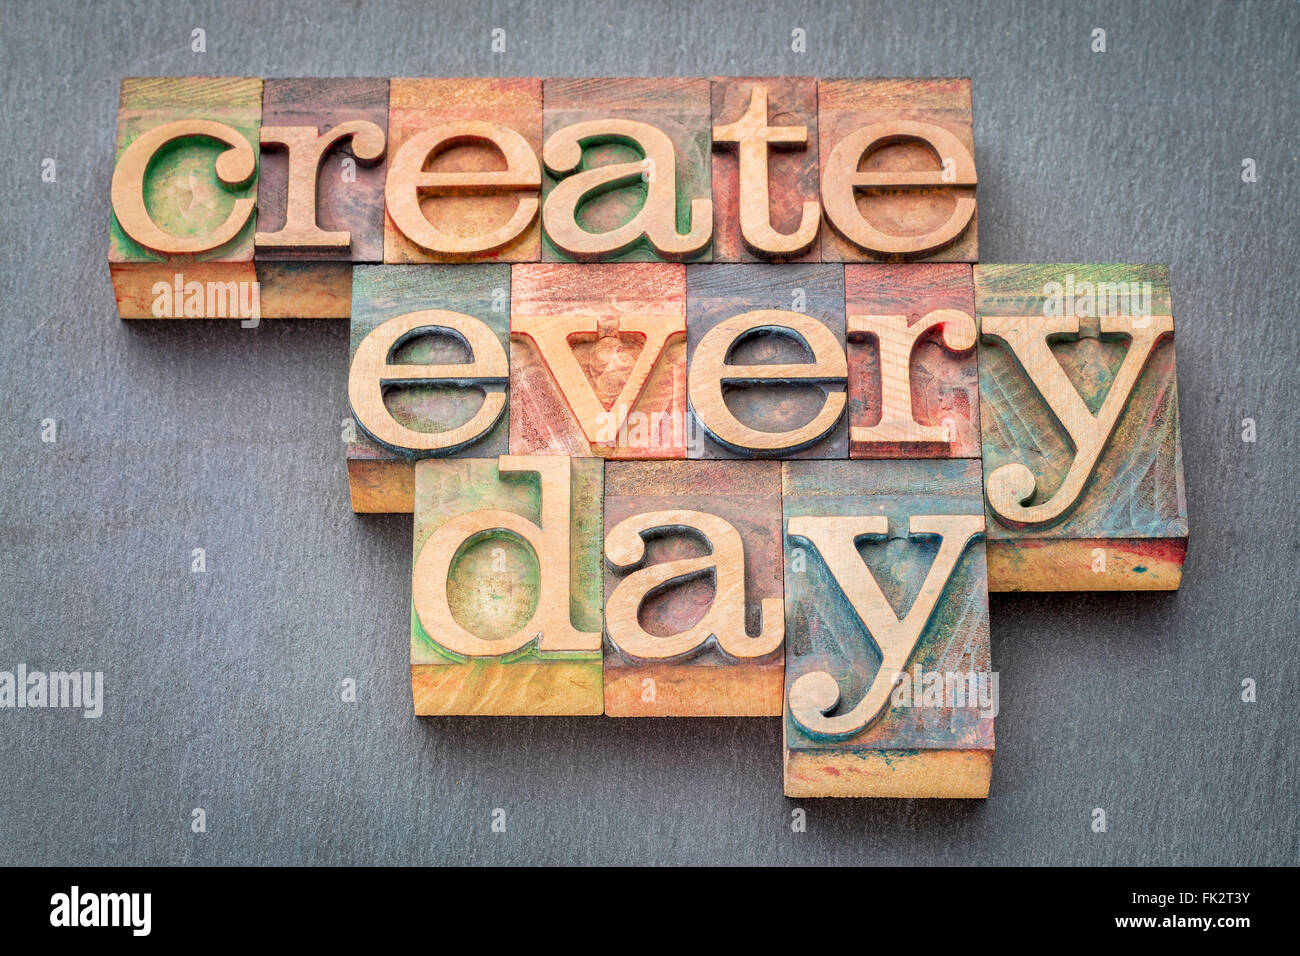 Crear cada día - frase de inspiración vintage tipografía tipo bloques de madera manchada por las Imagen De Stock